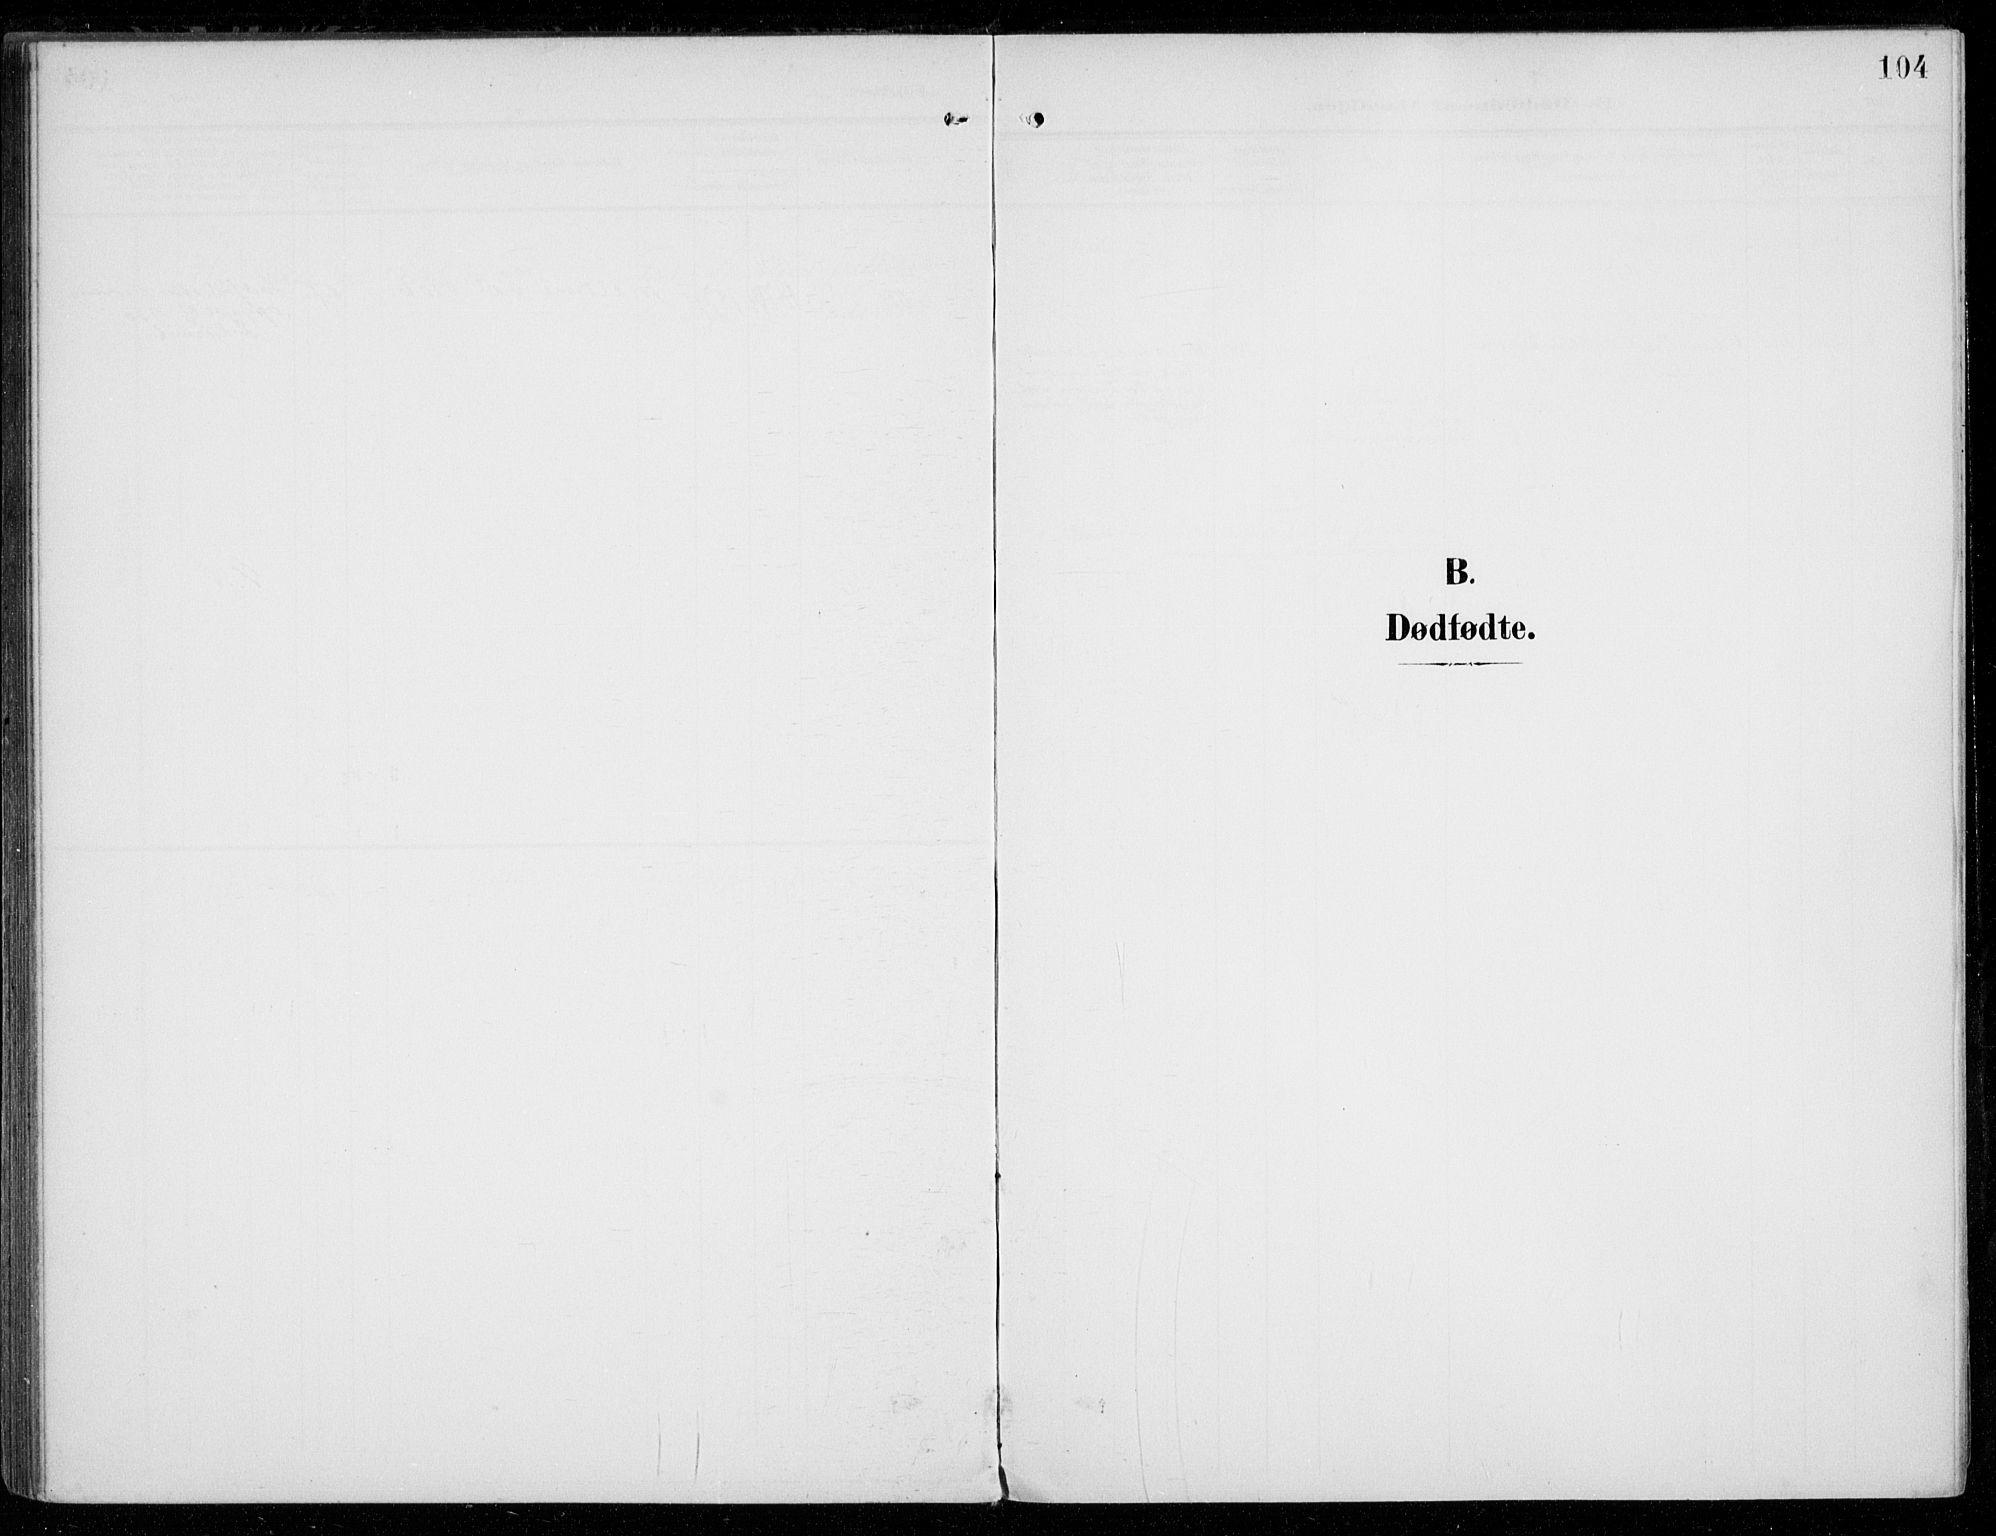 SAO, Vestby prestekontor Kirkebøker, F/Fc/L0002: Ministerialbok nr. III 2, 1906-1940, s. 104